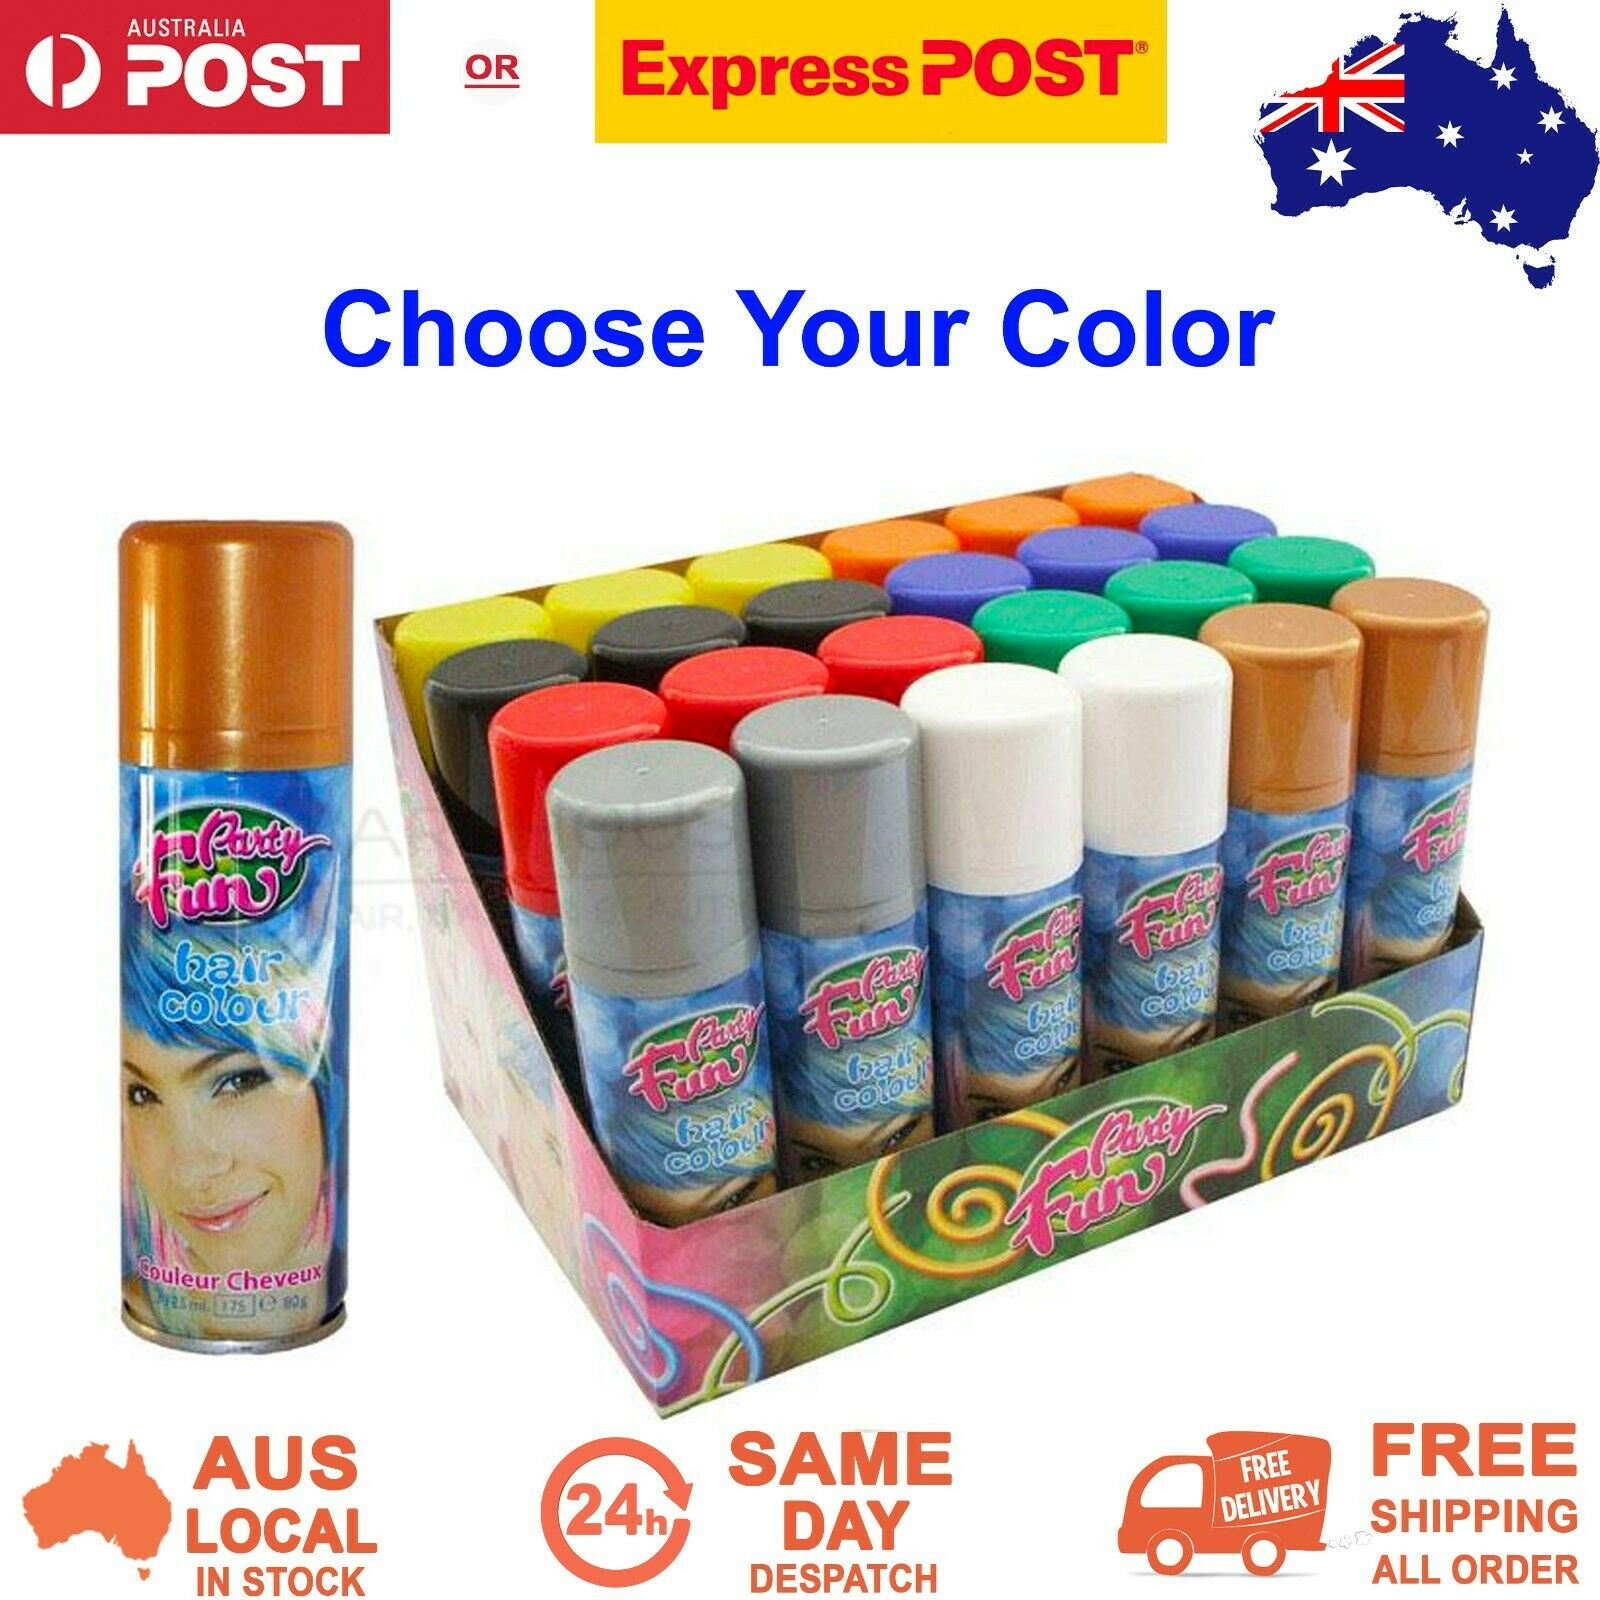 Party Fun Coloured Hair Spray Instant Temporary Wash Out Hair Colour 125 ml